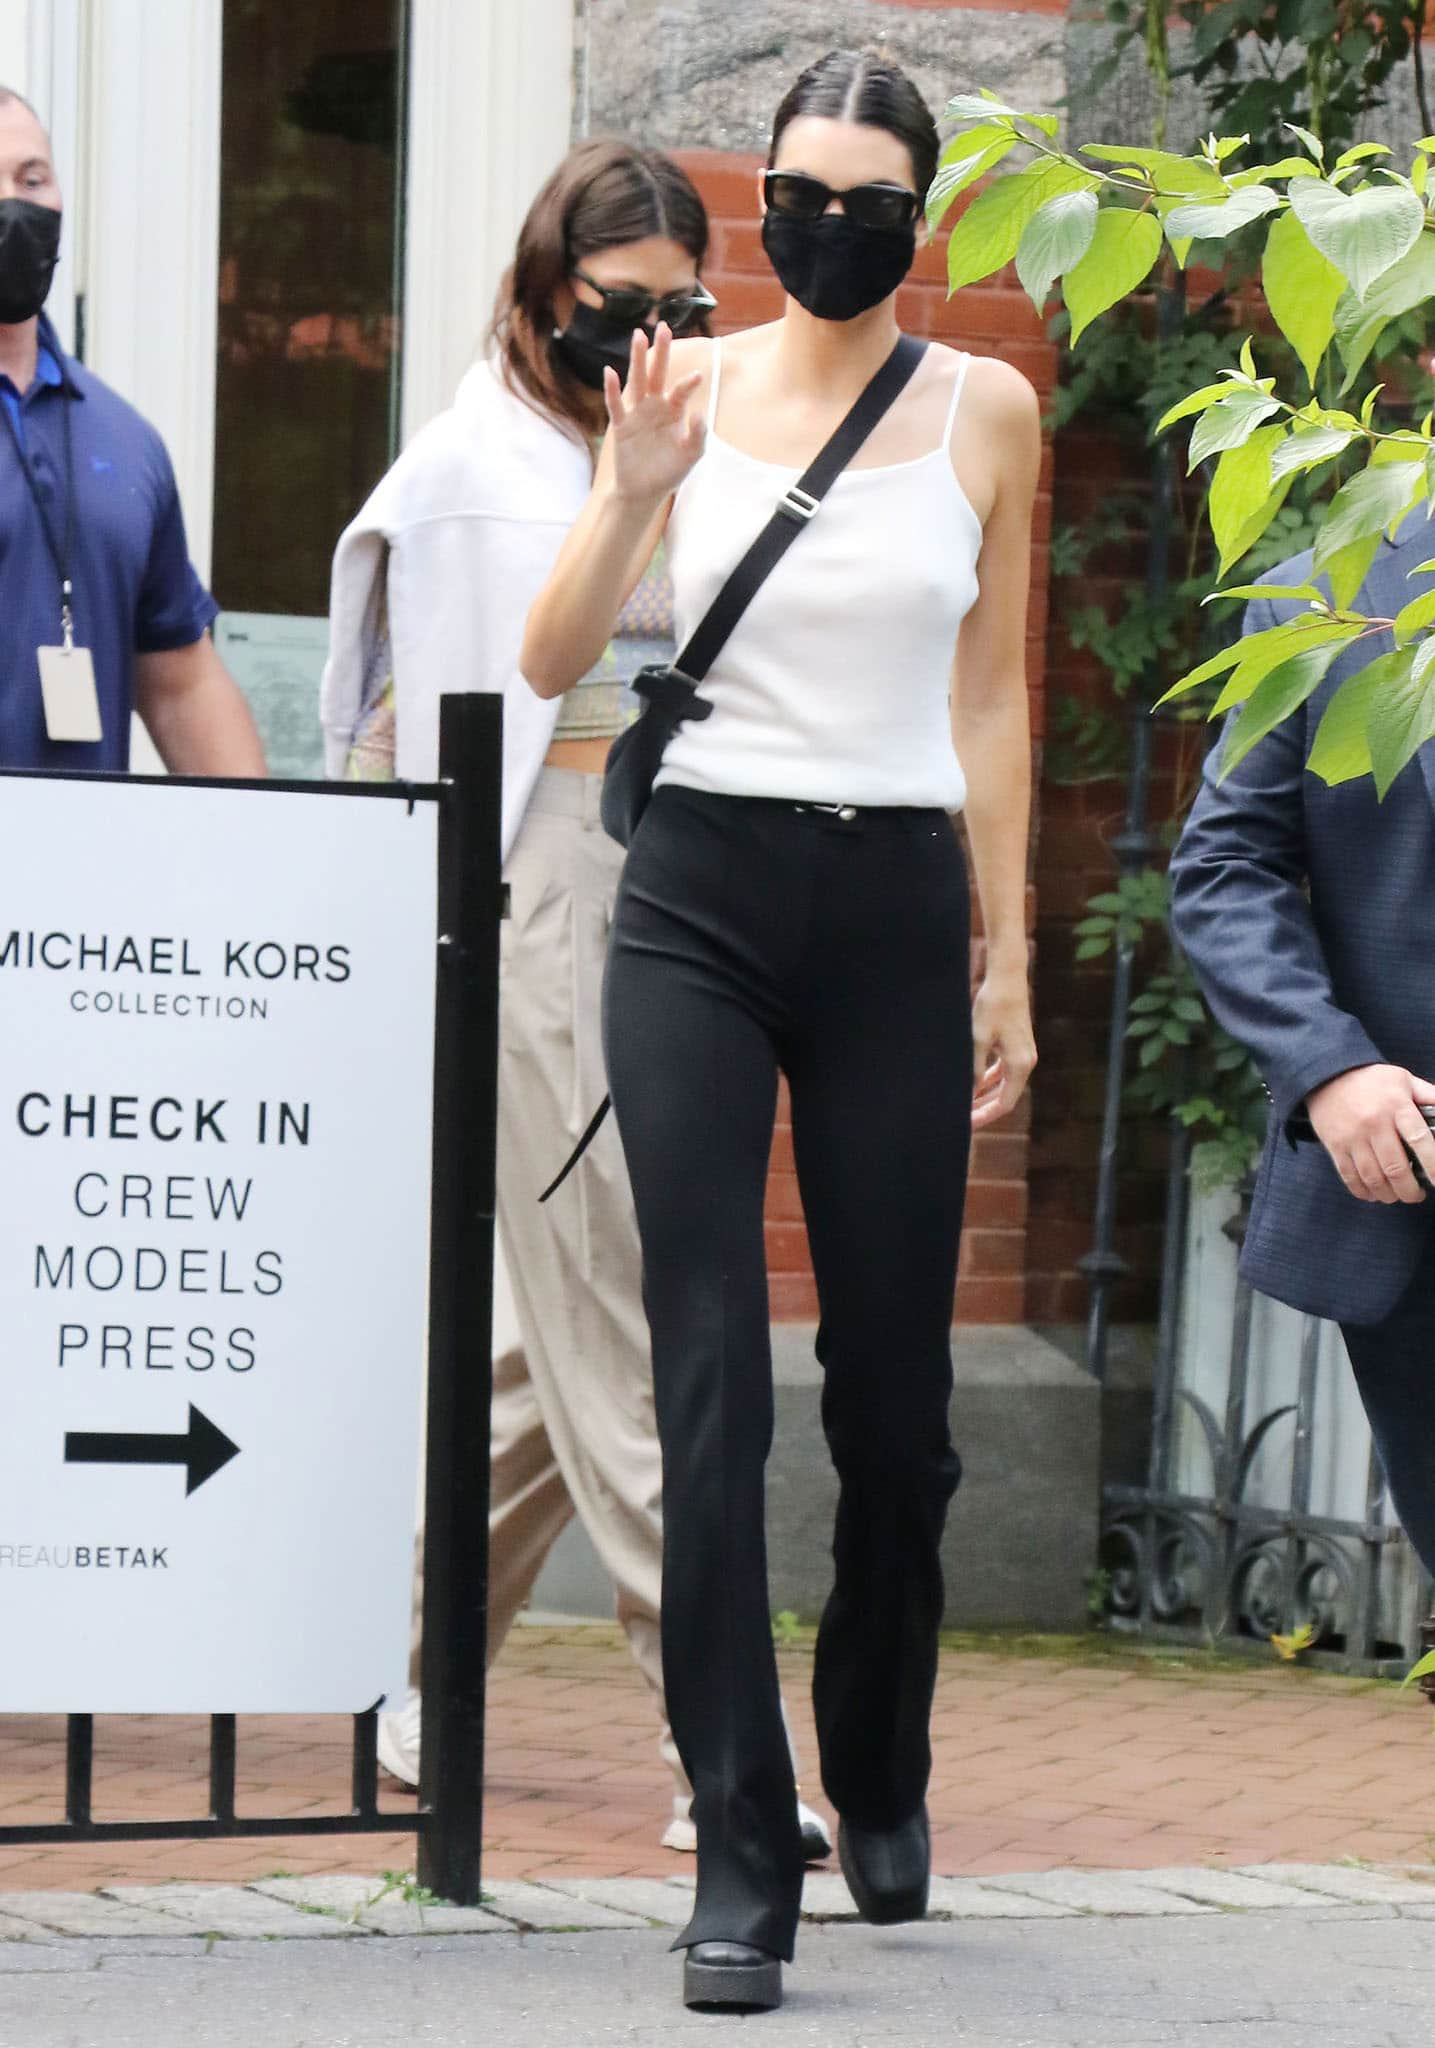 Kendall Jenner goes braless underneath a white tank top with Helmut Lang split hem pants